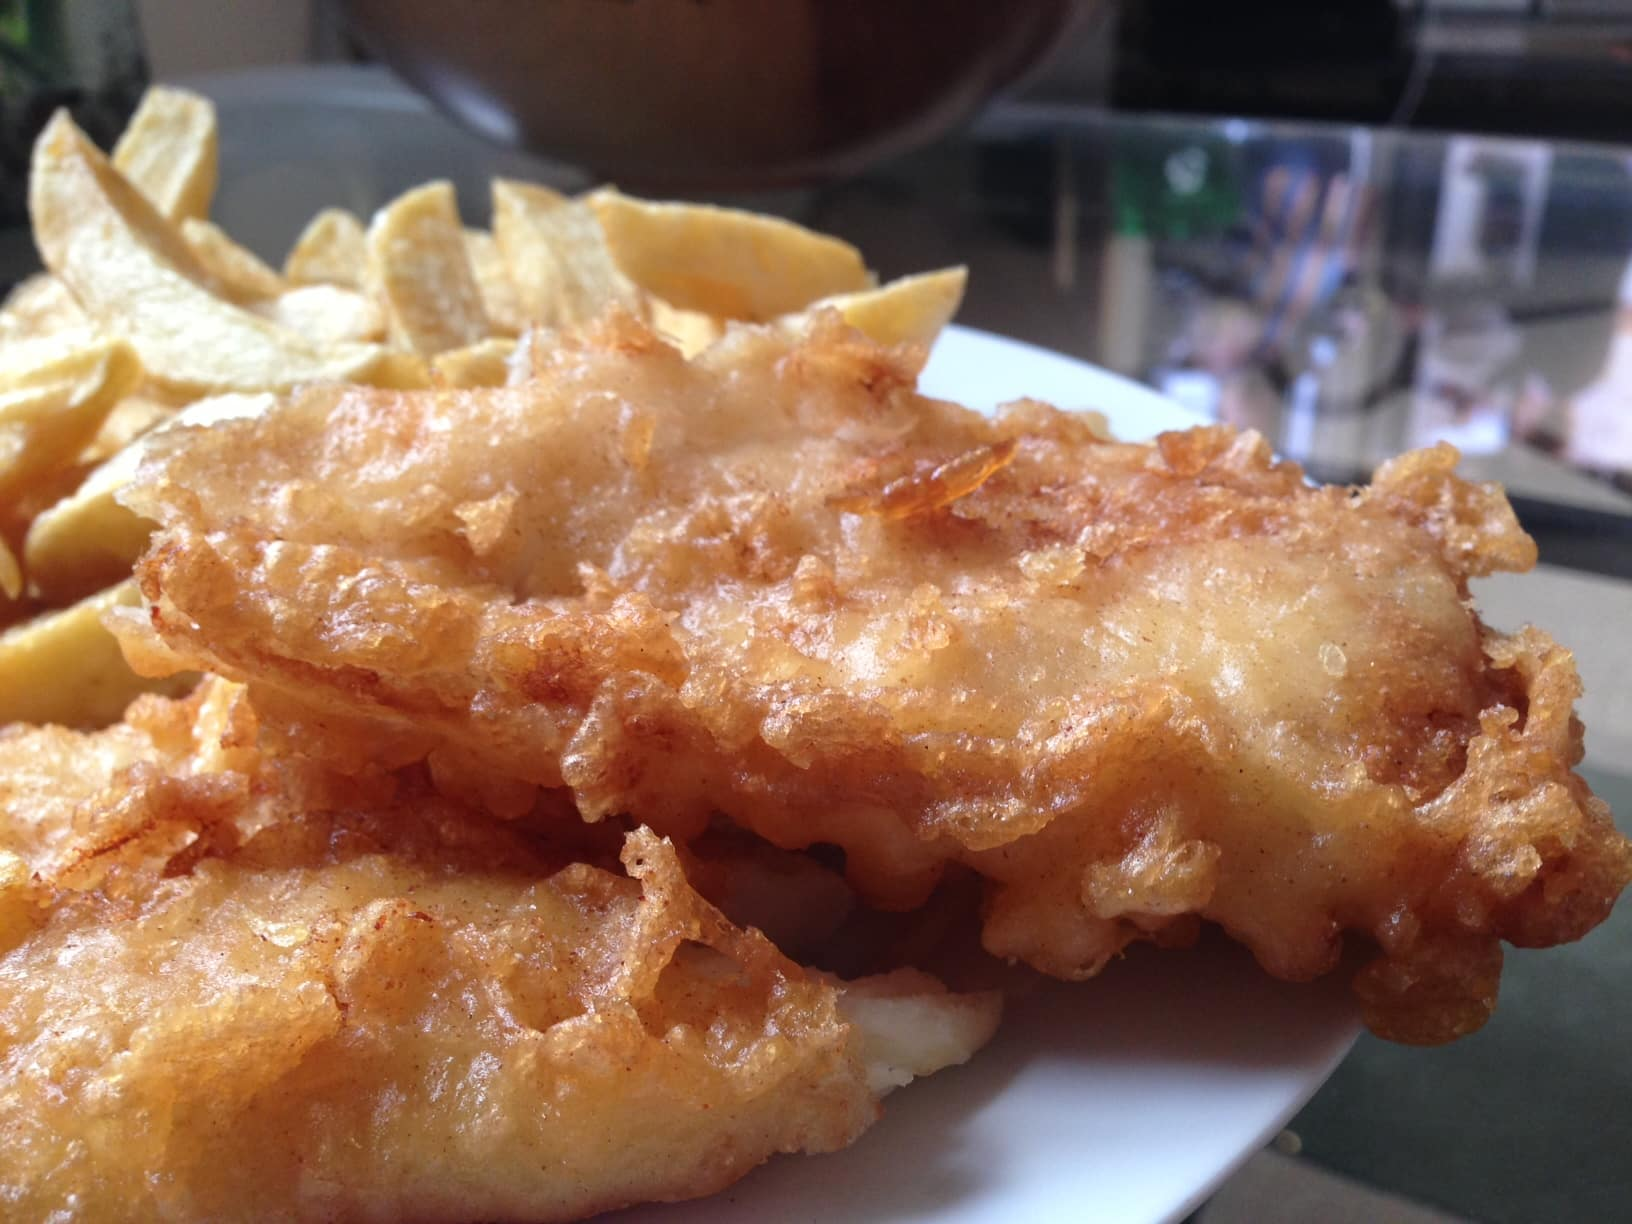 Sams takeaway fish chips Medbourne Milton Keynes